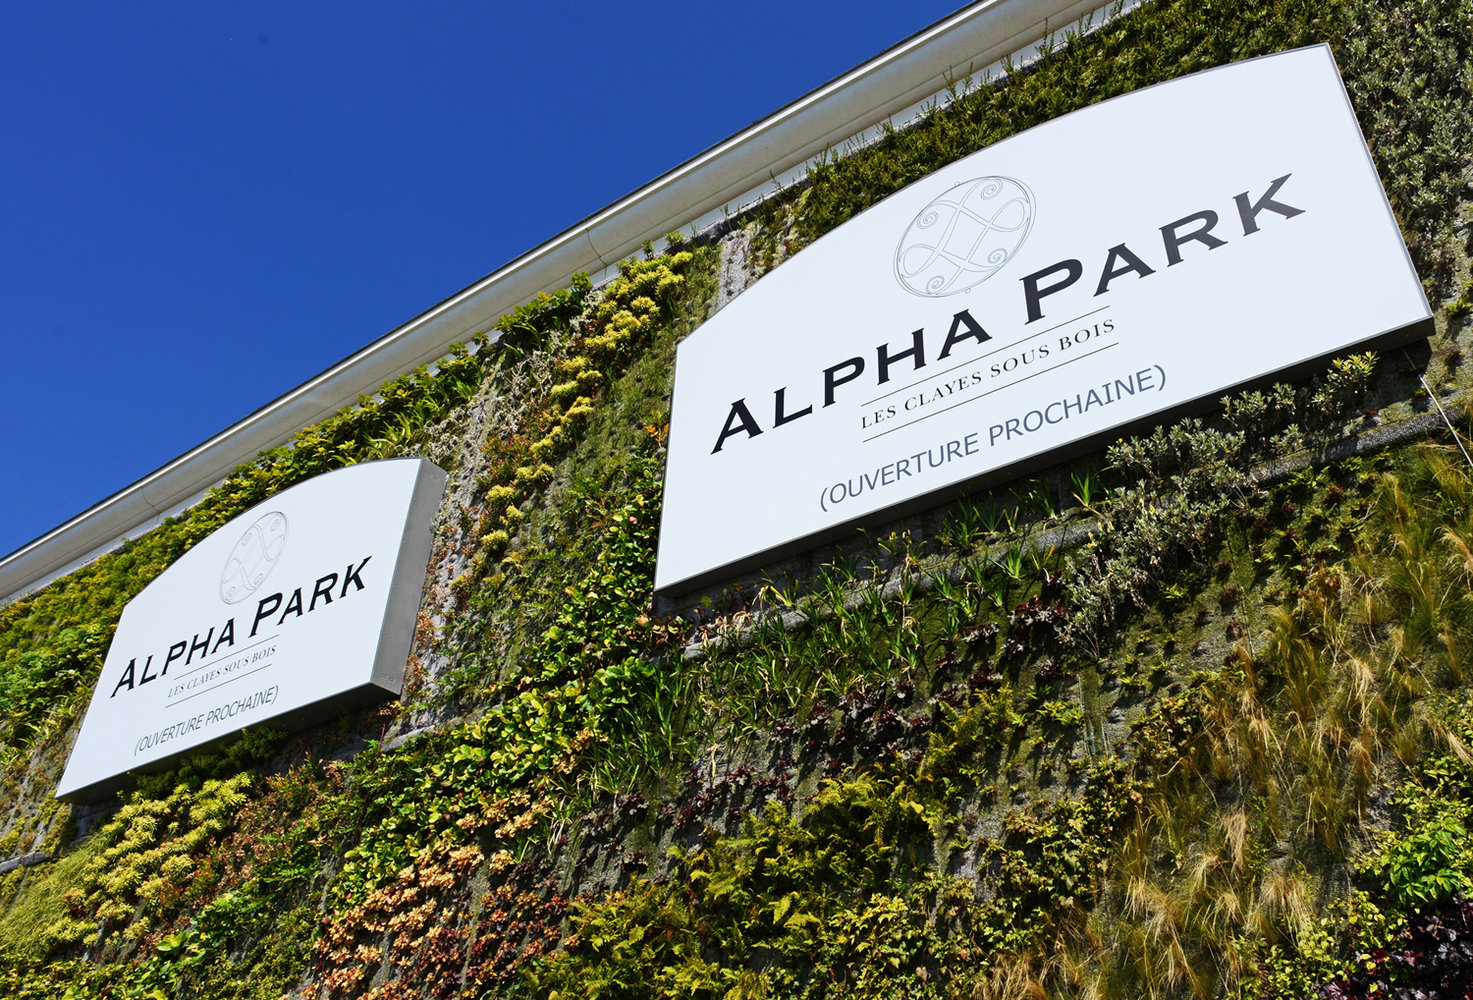 alpha park 2 façade sud début download alpha park 2 façade sud